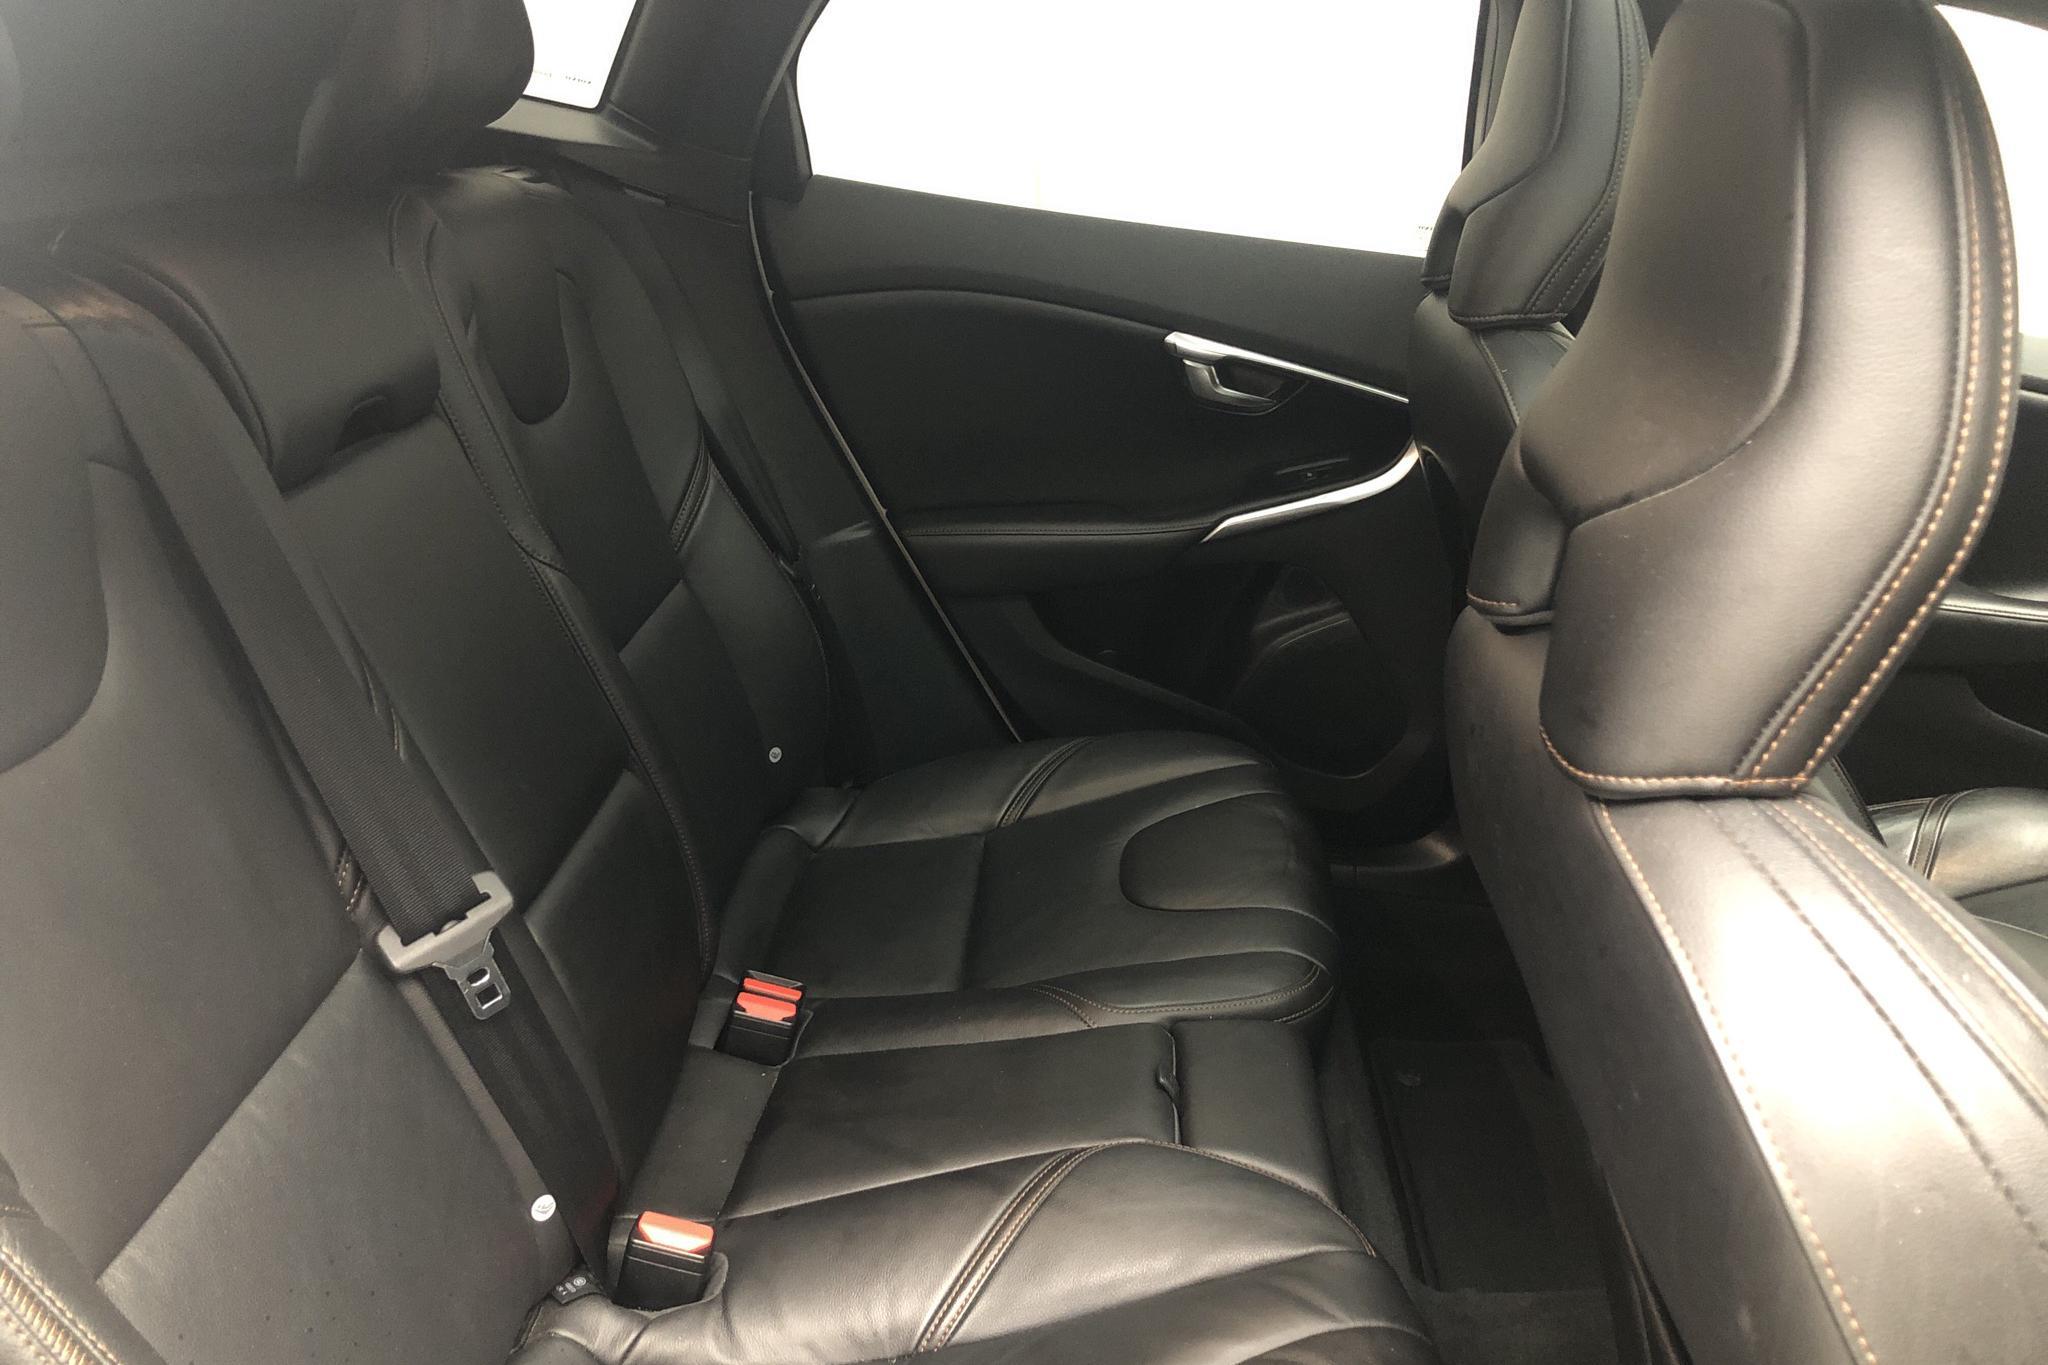 Volvo V40 Cross Country D4 (190hk) - 65 380 km - Automatic - white - 2017